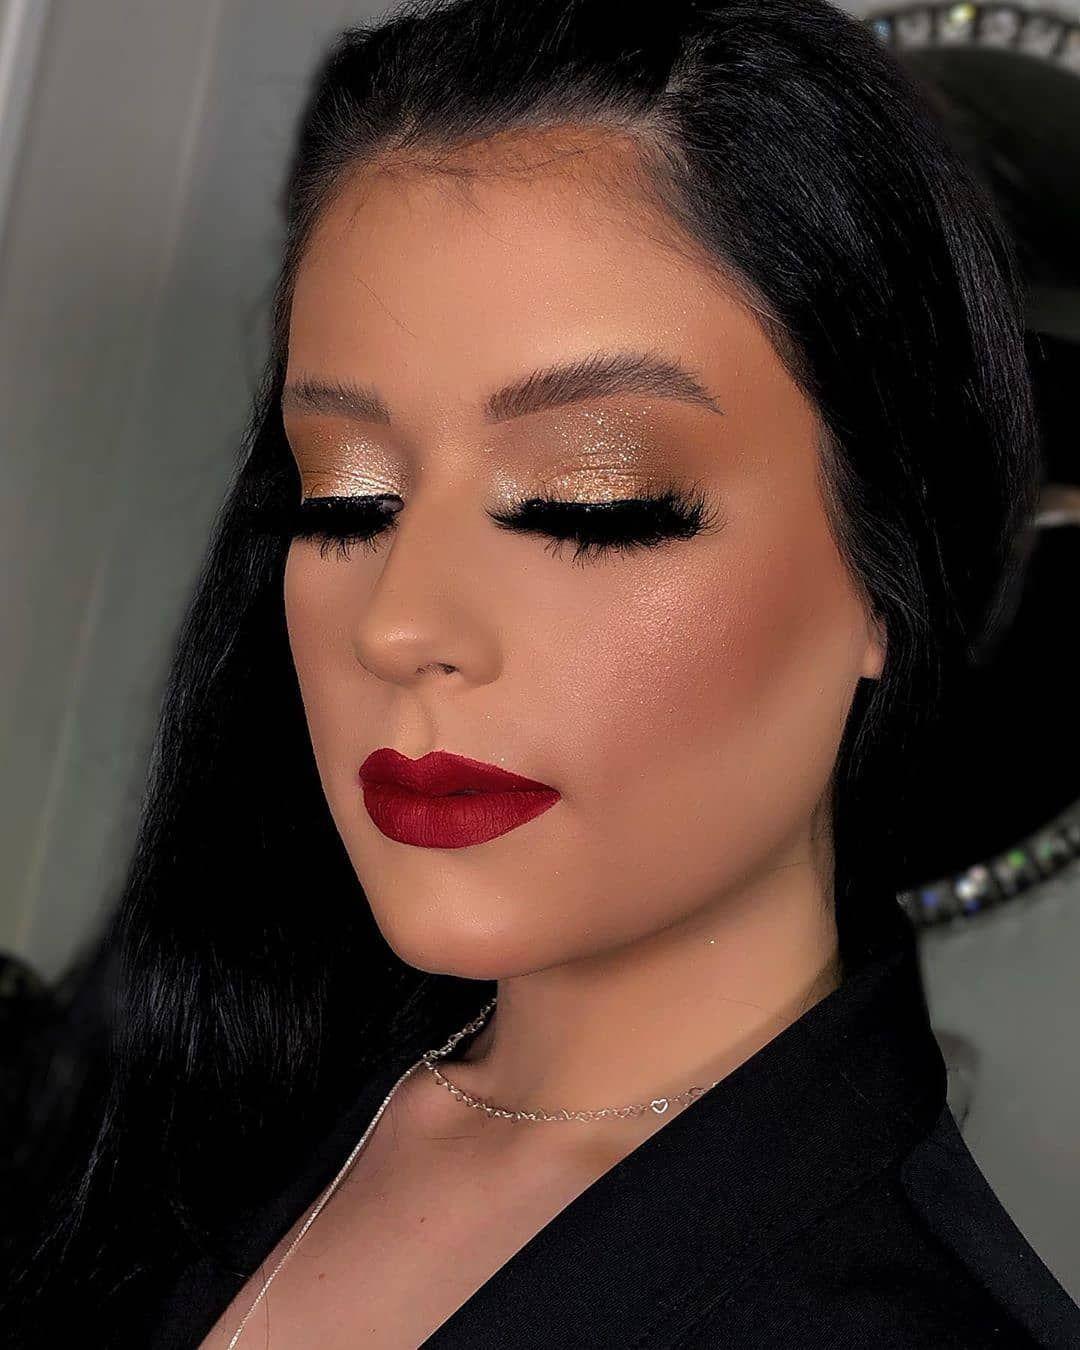 makeup in 2020 Liquid glitter eyeshadow, Turquoise